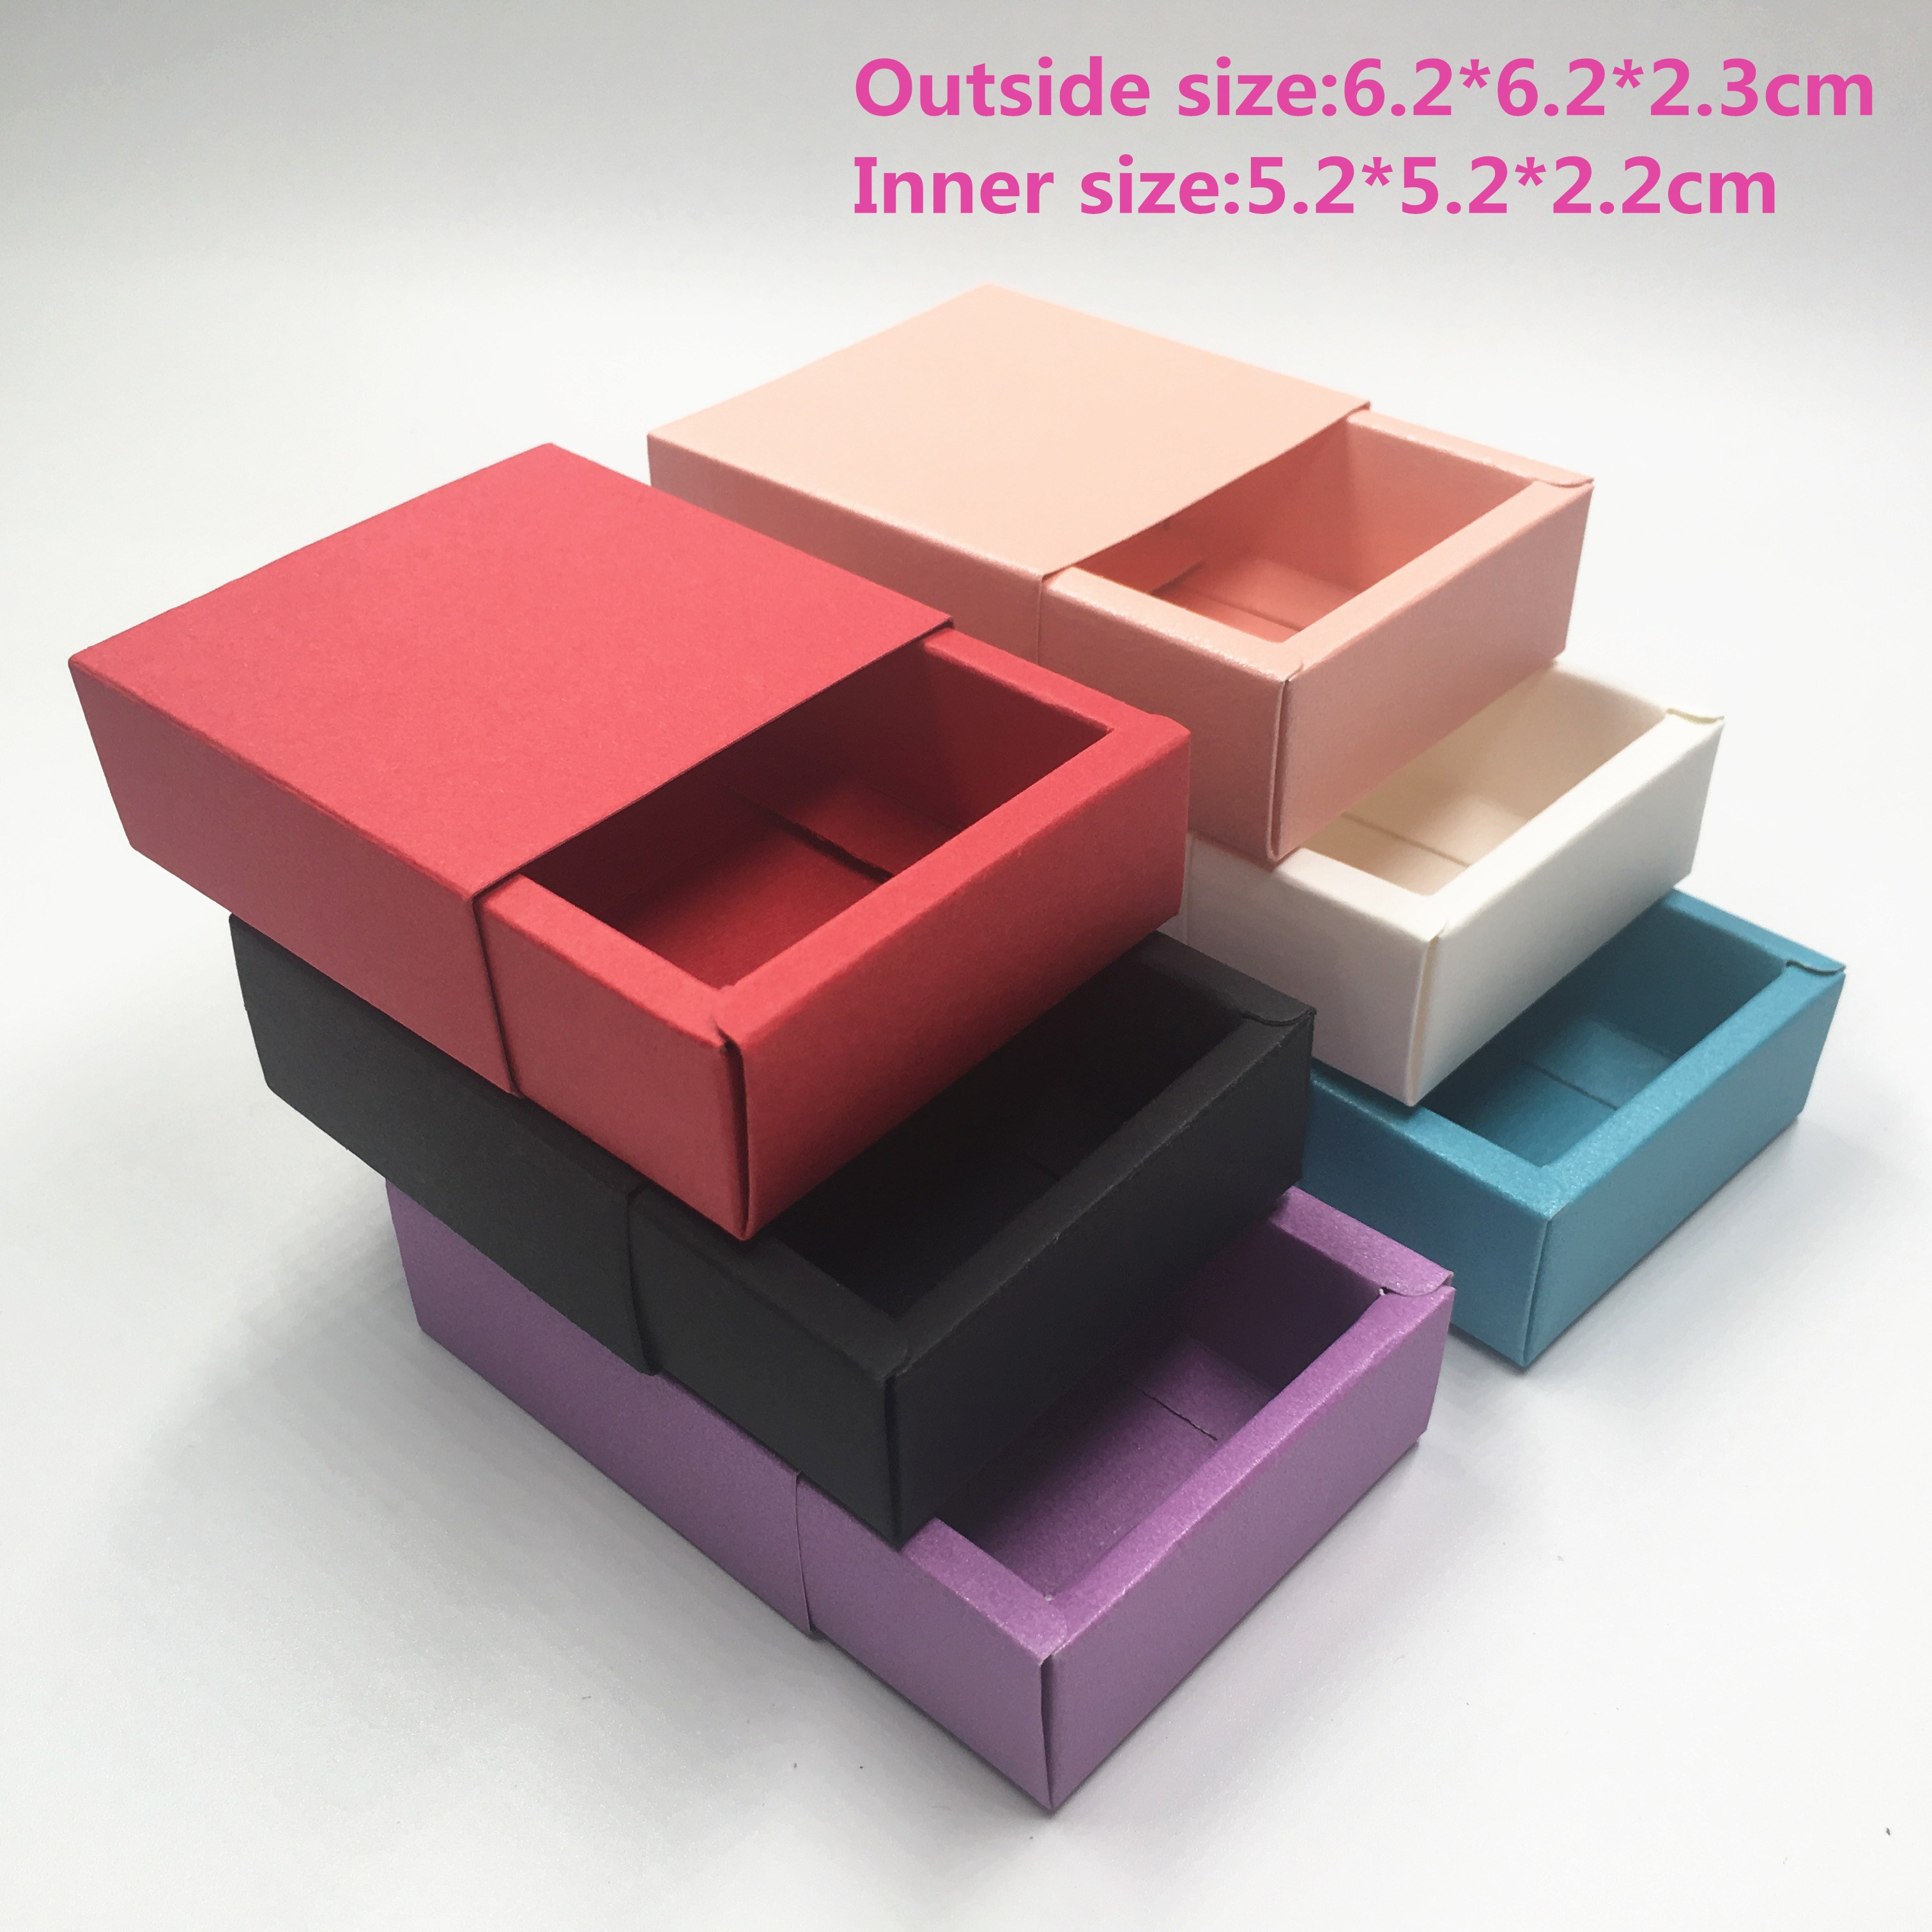 10pcs/lot Multi-size Colorful Cardboard Drawer Type Paper Box Jewelry  Gift Boxes Handmade Carton Folding Storage Box